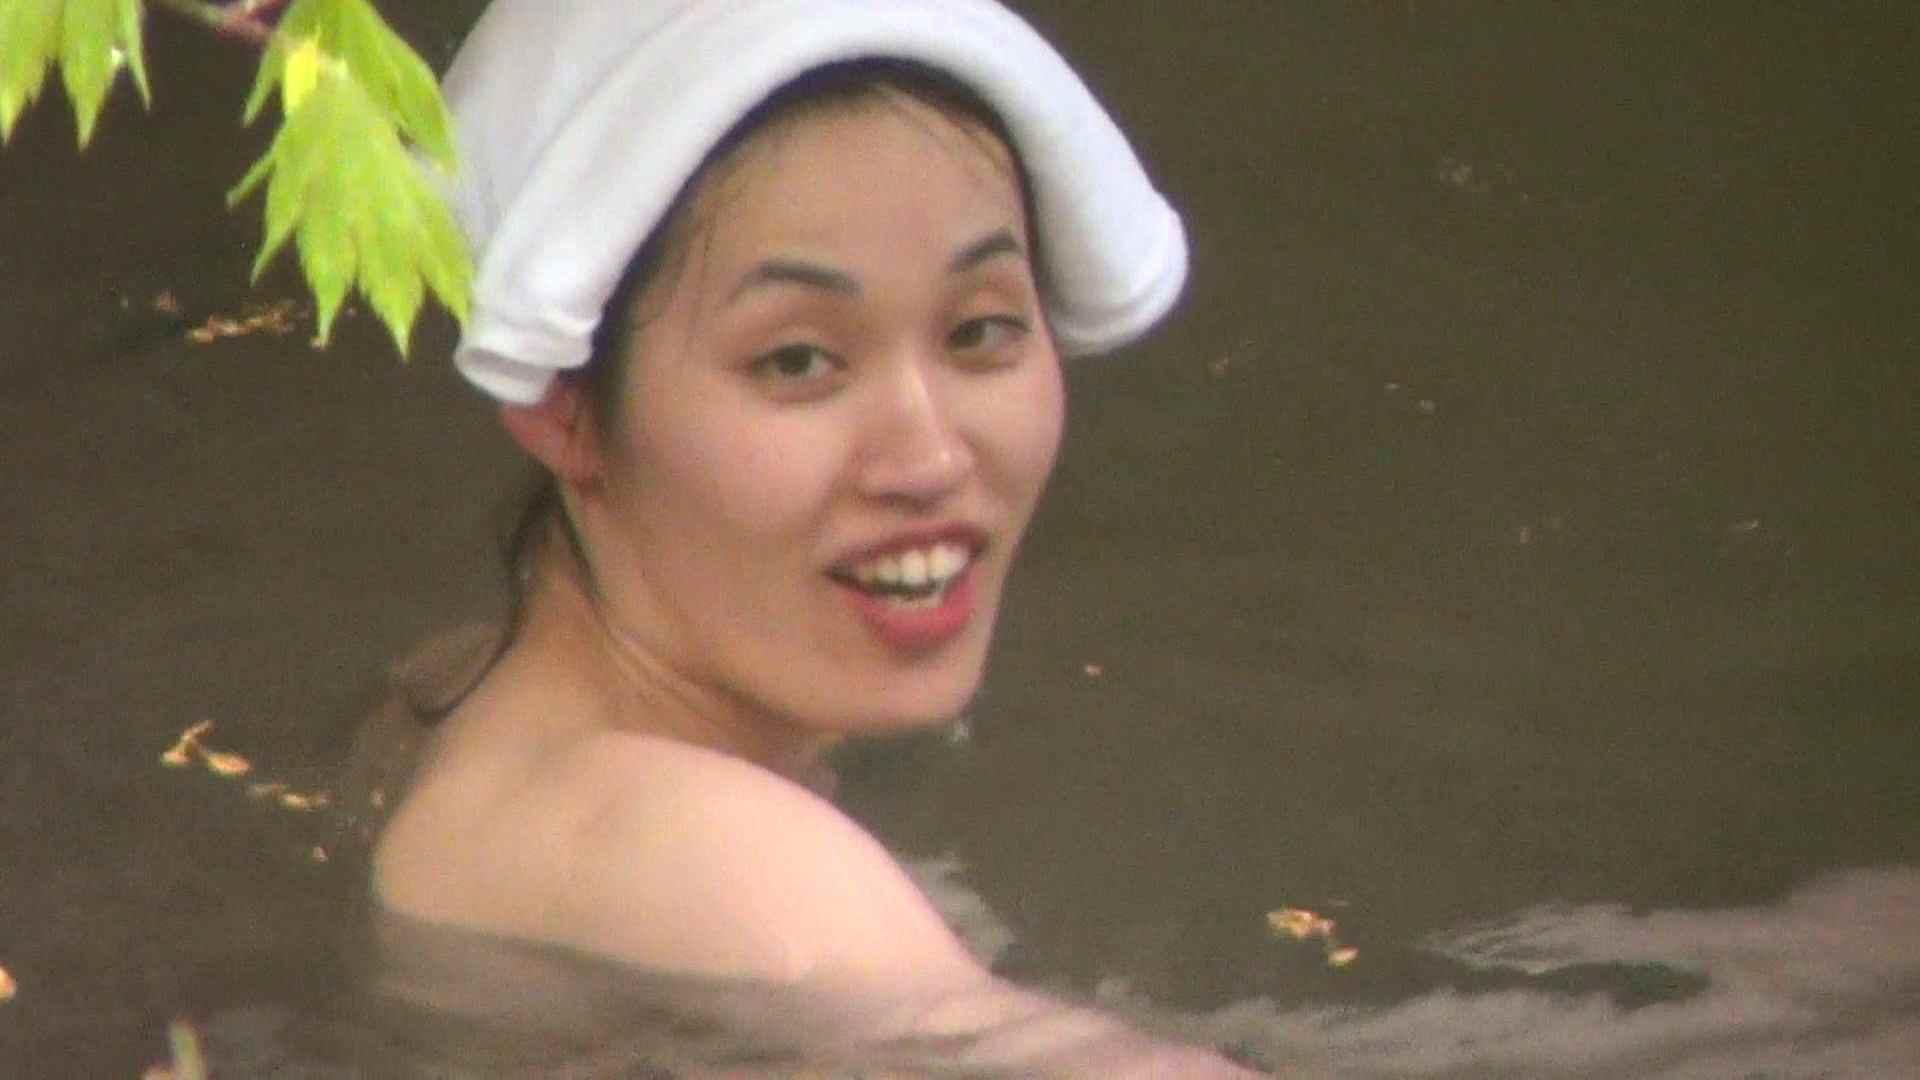 Aquaな露天風呂Vol.235 0  51連発 24